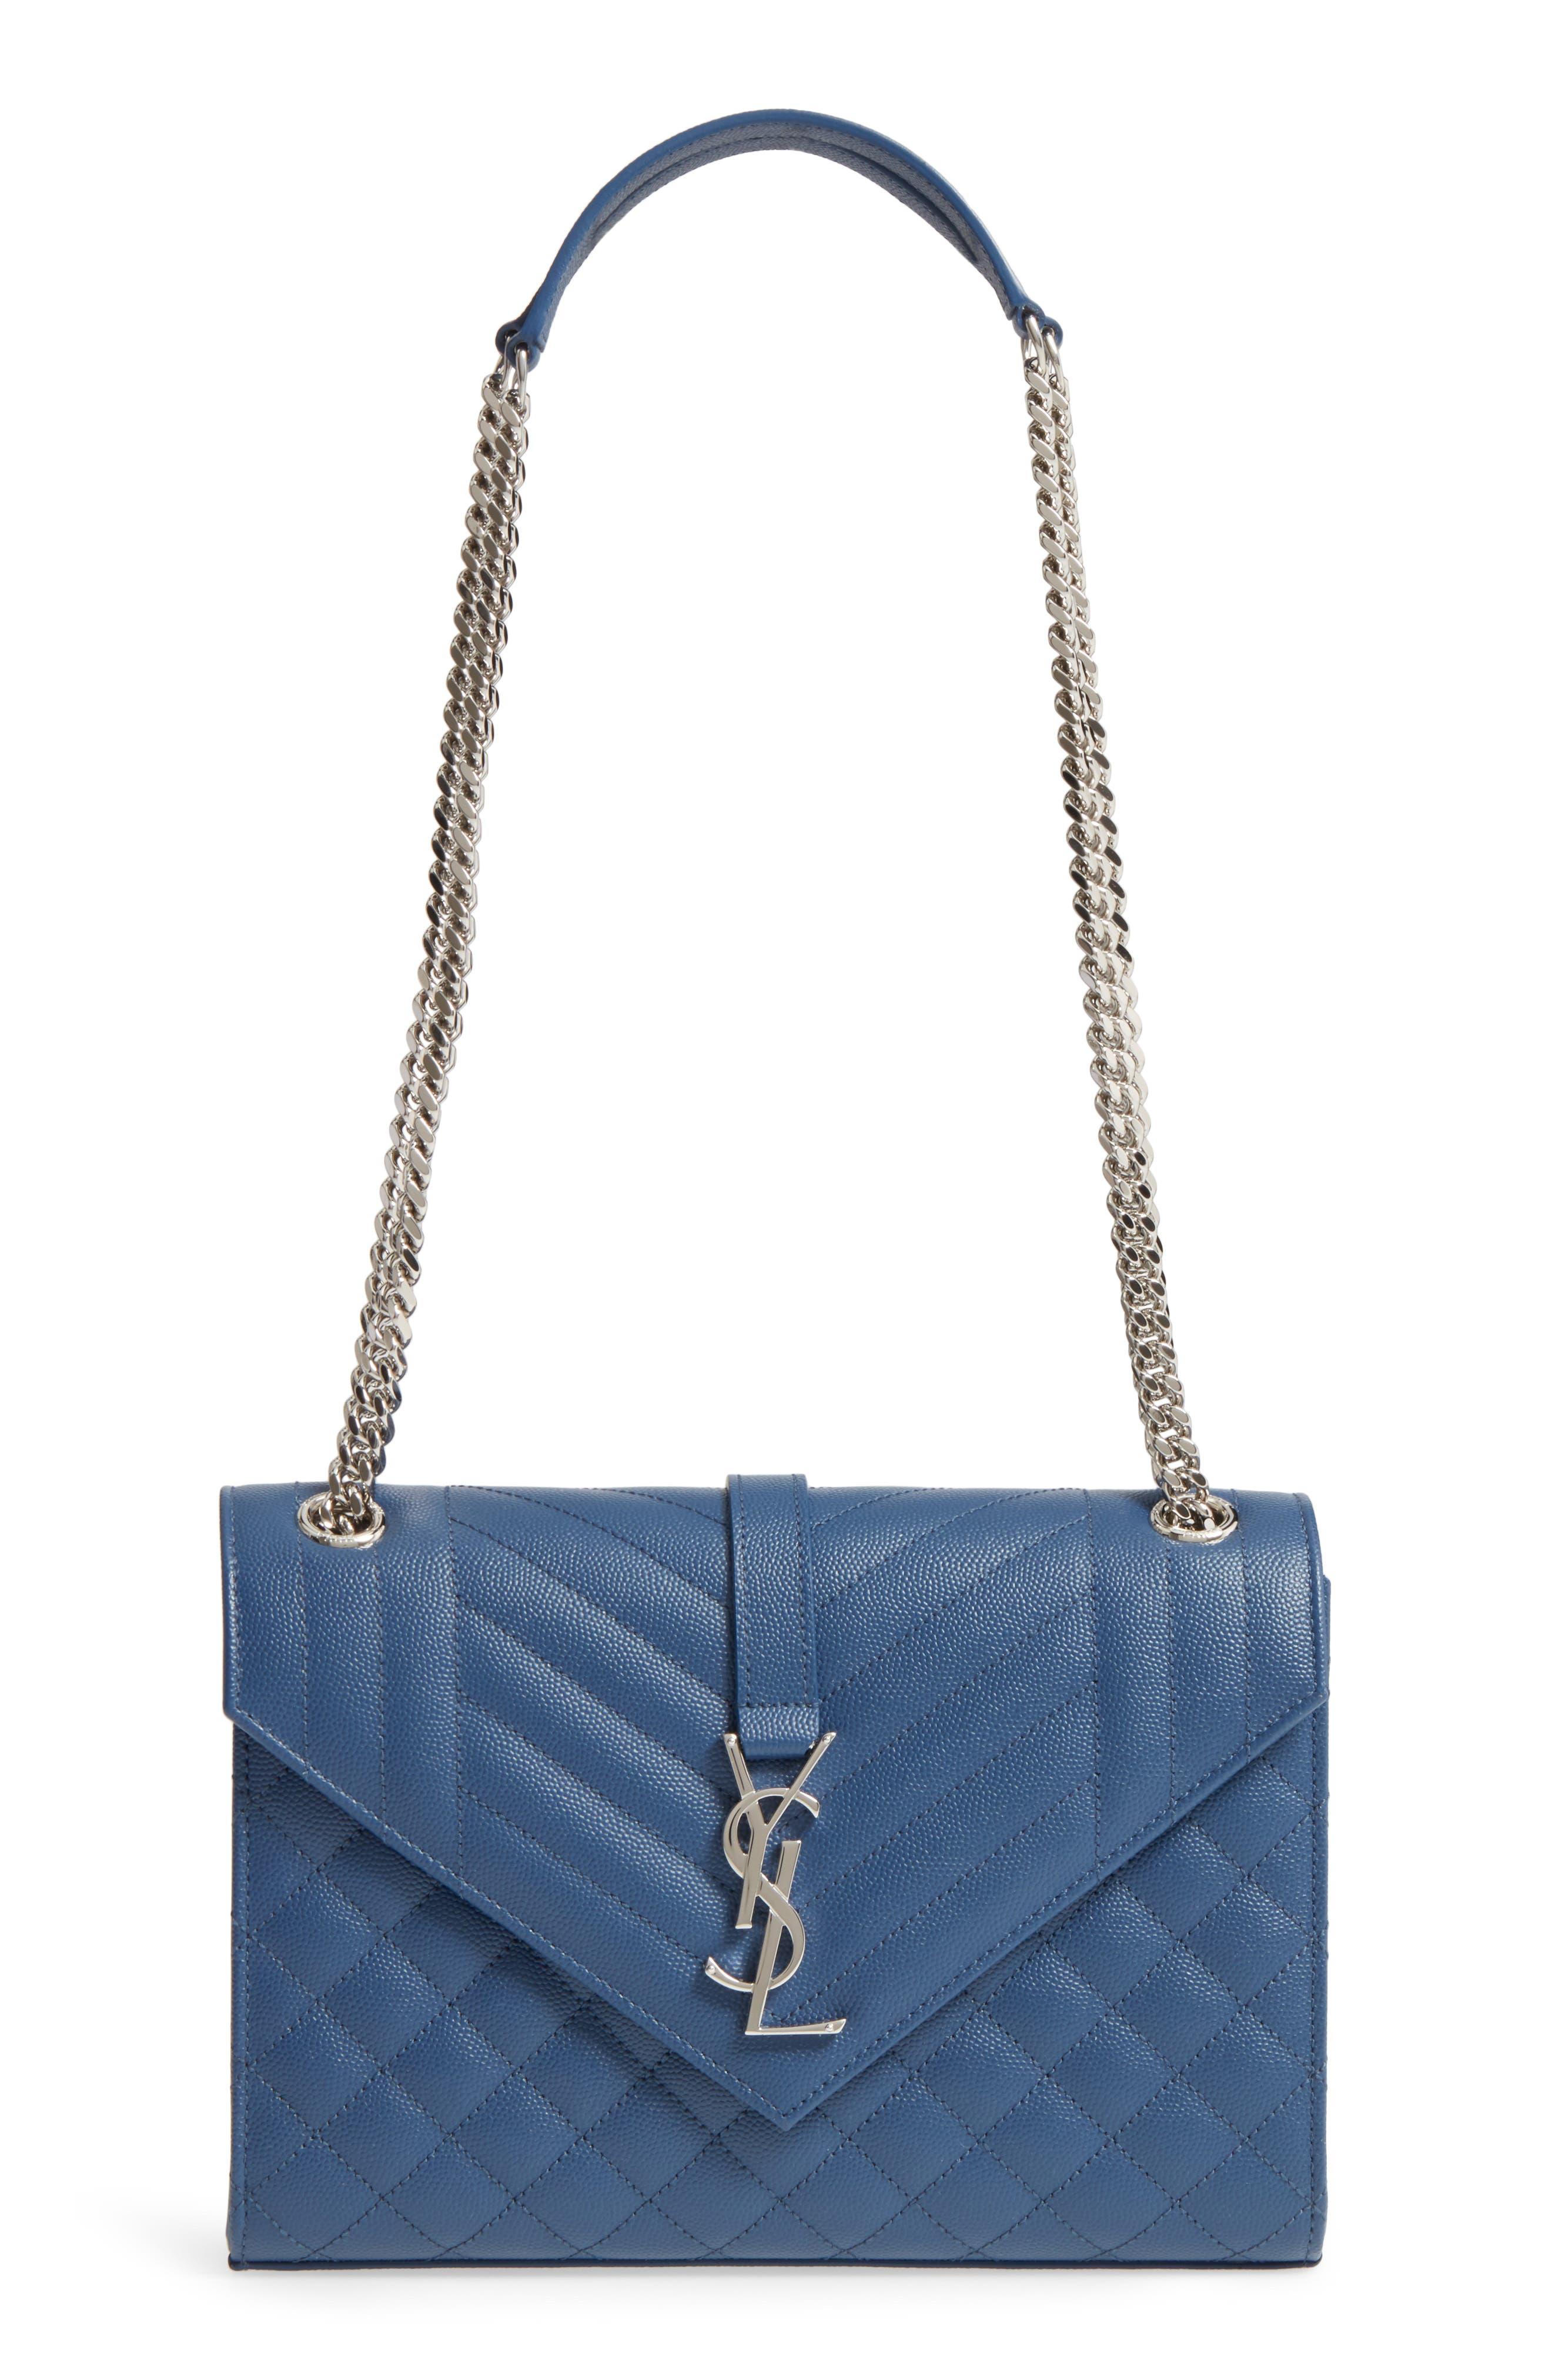 Medium Cassandra Calfskin Shoulder Bag,                             Main thumbnail 1, color,                             DEEP MARINE